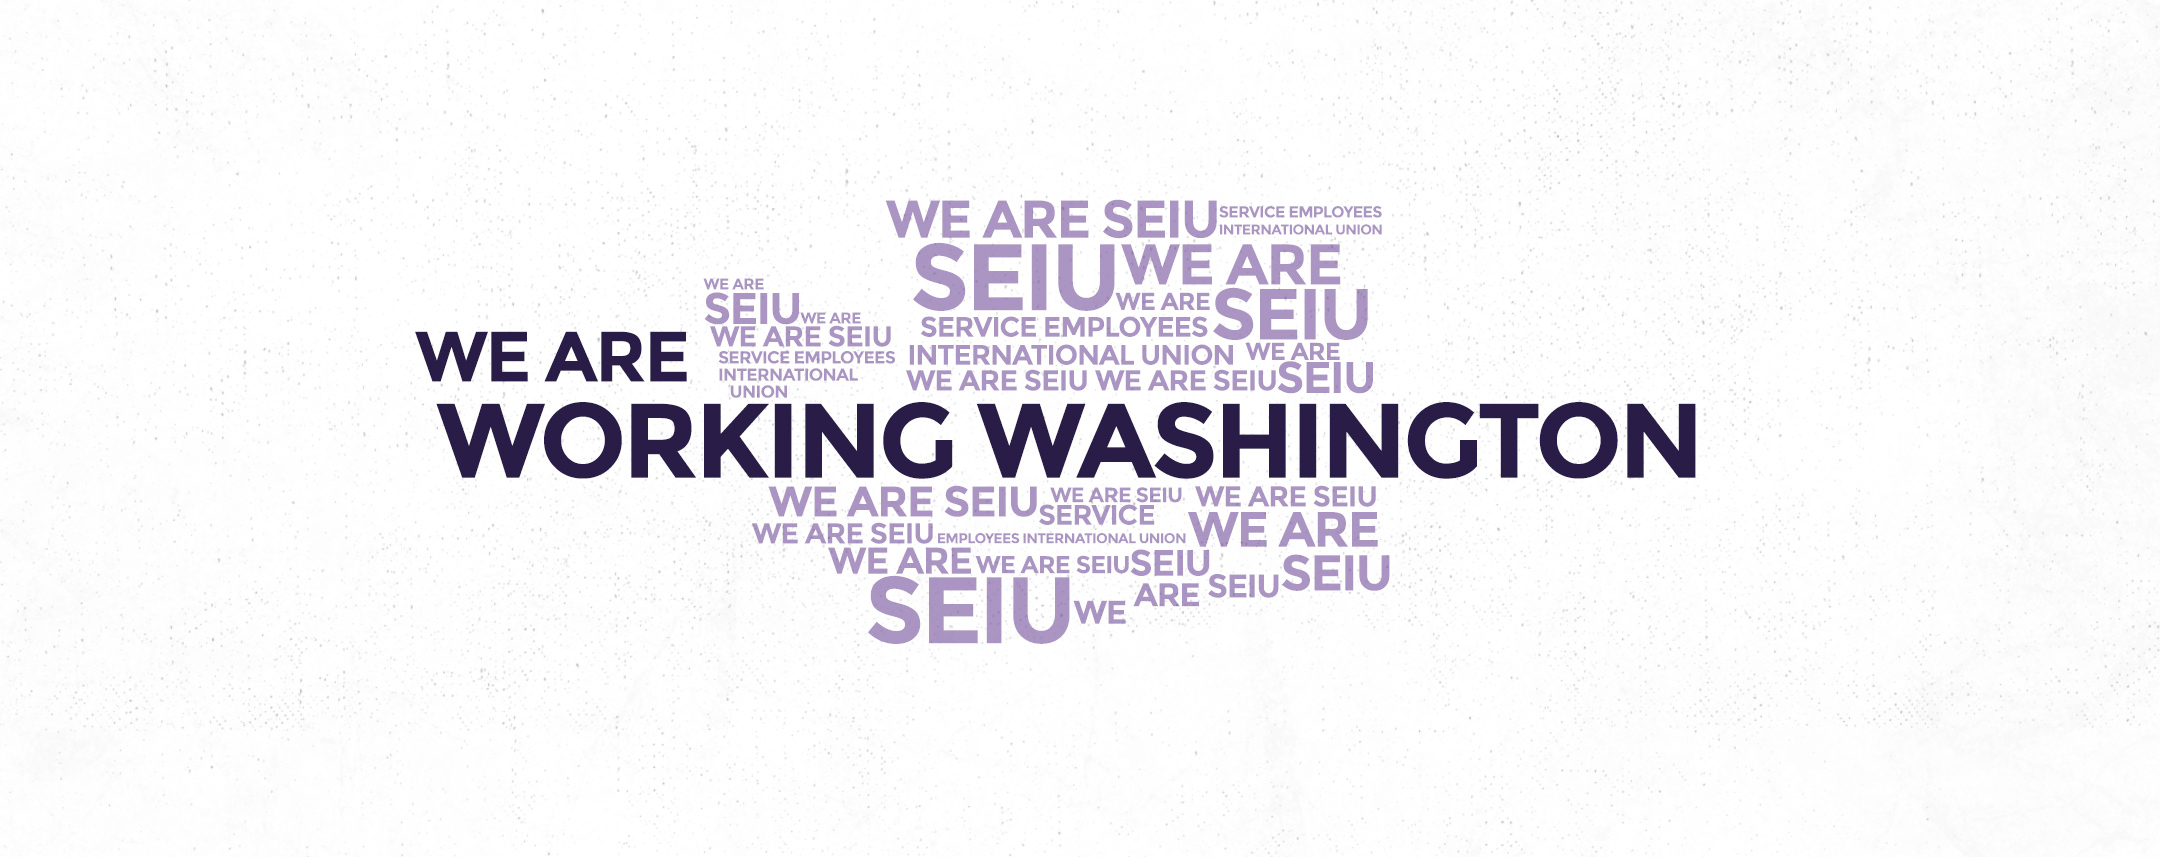 we-are-working-washington-FEATURED.jpg